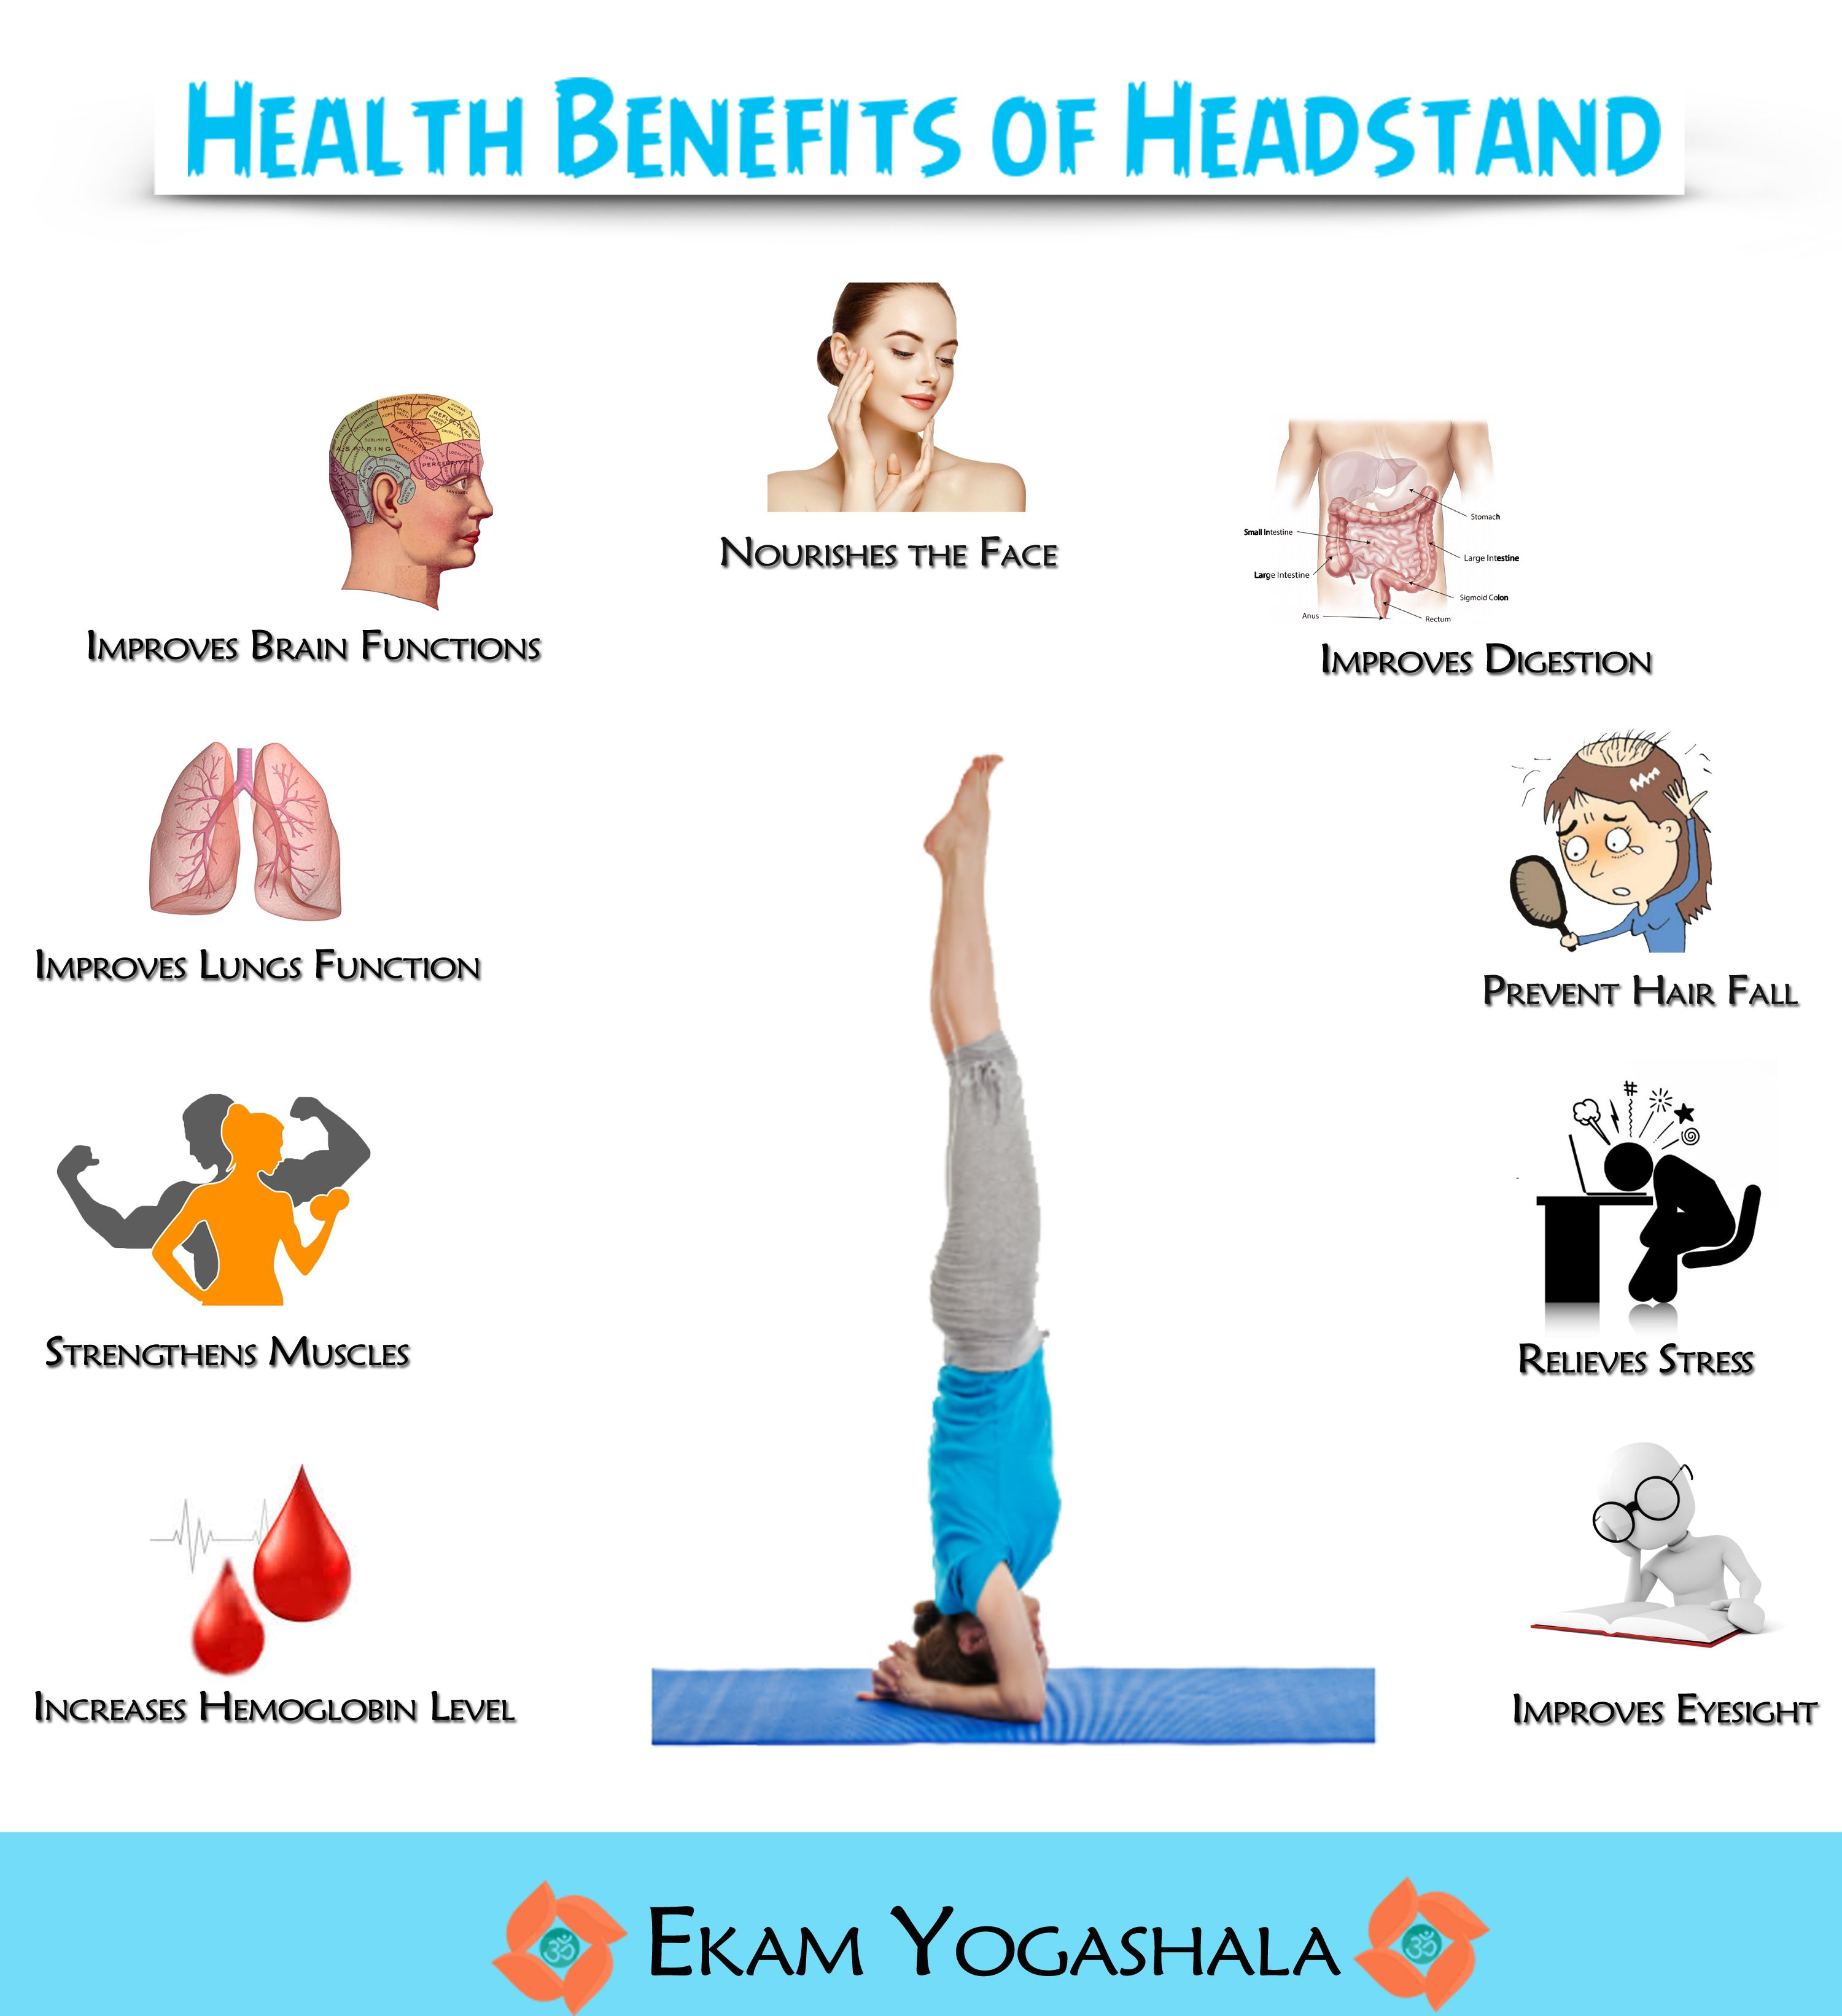 Headstand Yoga Health Benefits